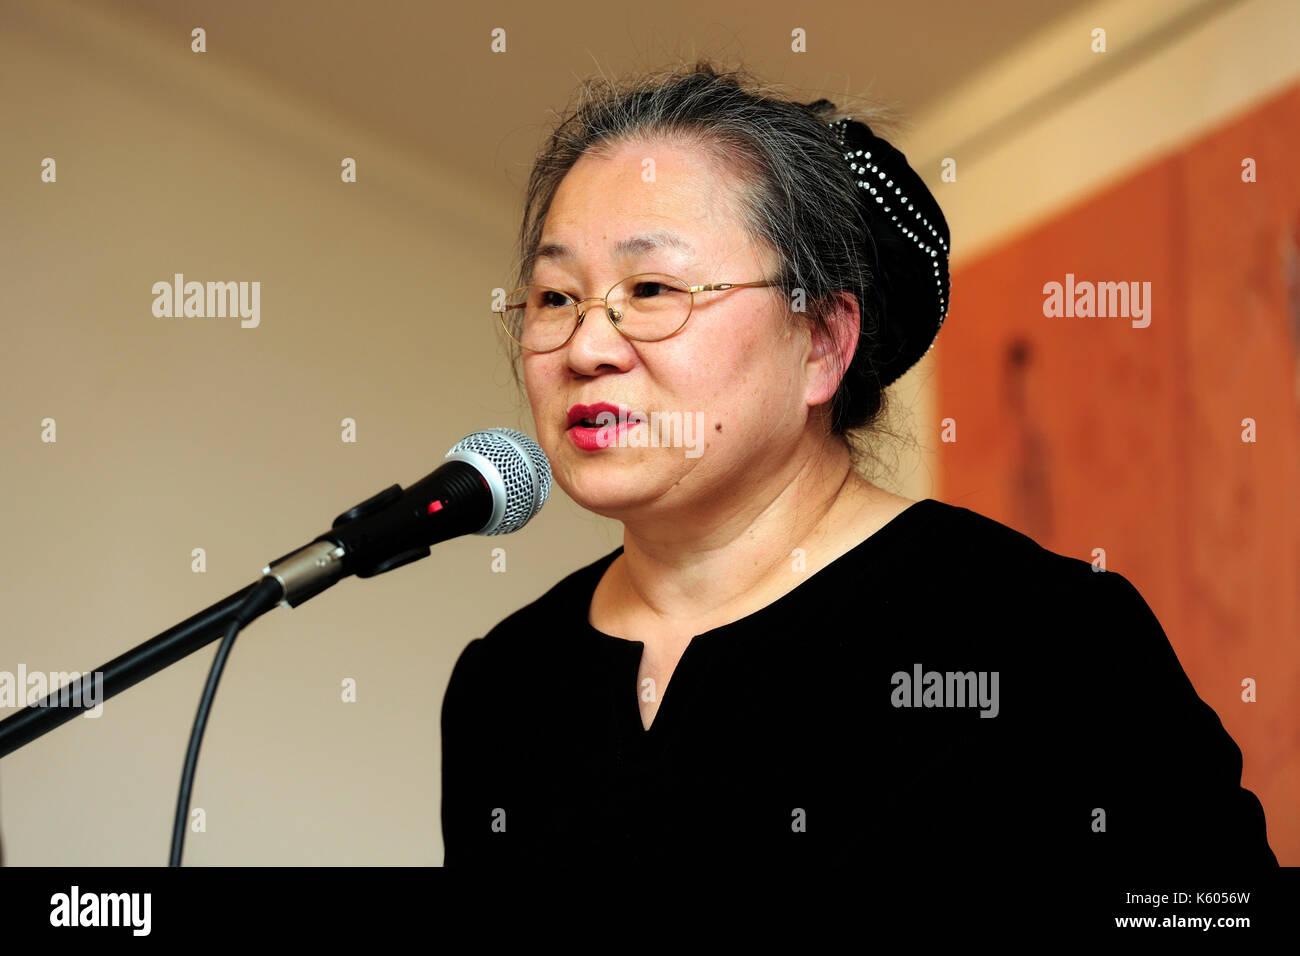 Sooki, stilles Leben, Artist, Künstler, Ausstellung, Südkorea, Youn-sook Koeppel, Stockbild